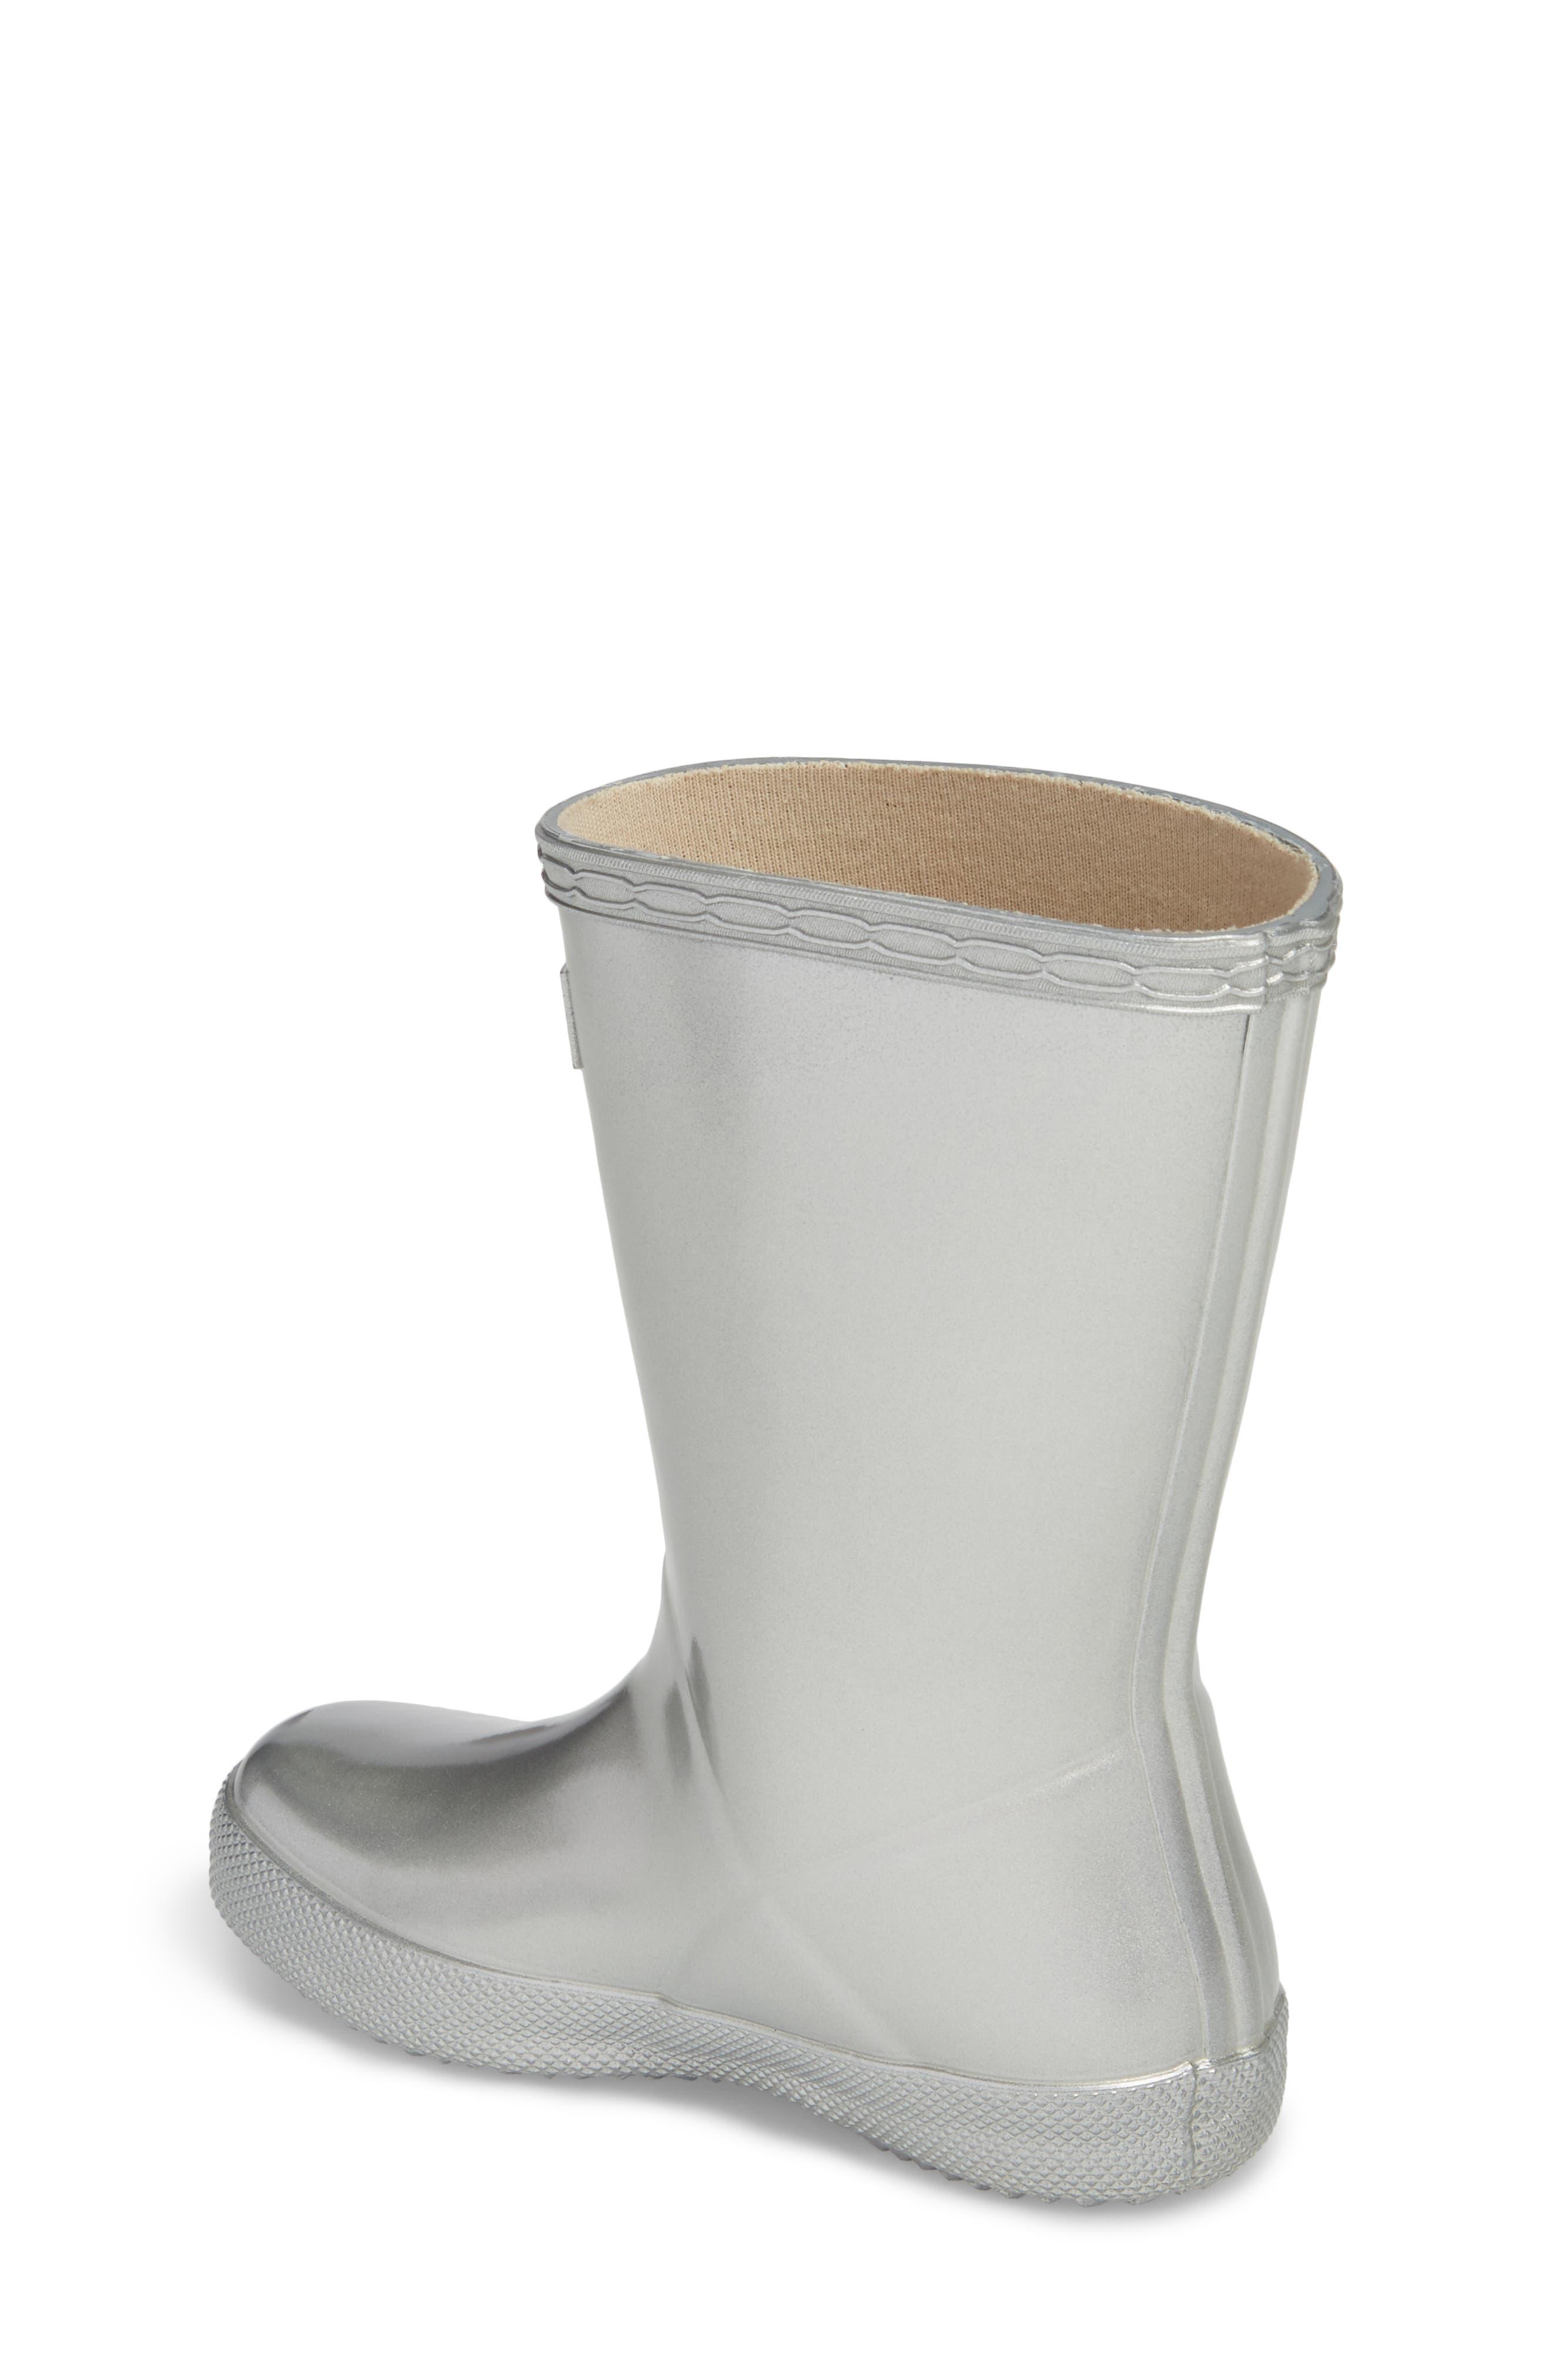 HUNTER,                             First Classic Metallic Waterproof Rain Boot,                             Alternate thumbnail 2, color,                             SILVER